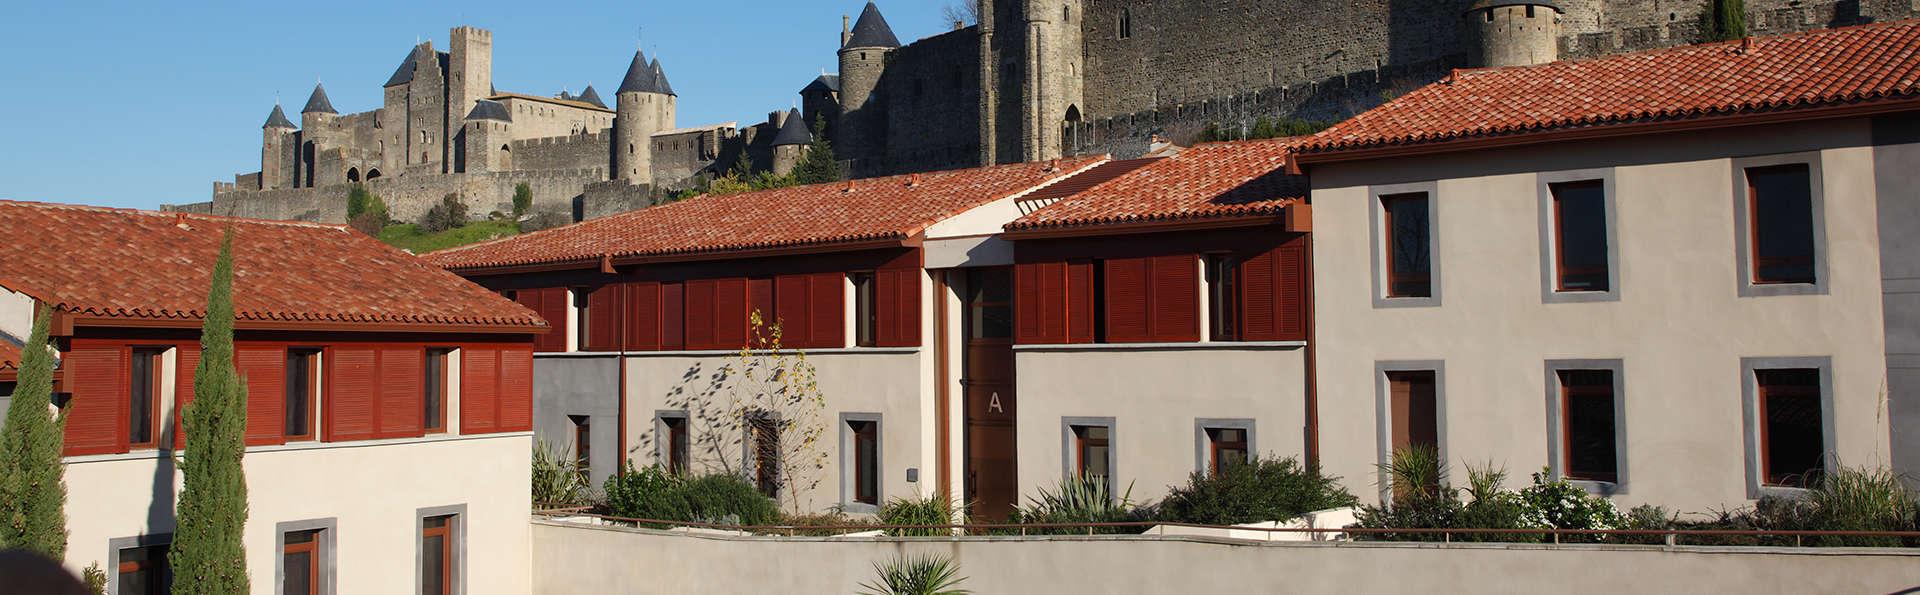 Adonis Carcassonne - La Barbacane - EDIT_Exterior2.jpg